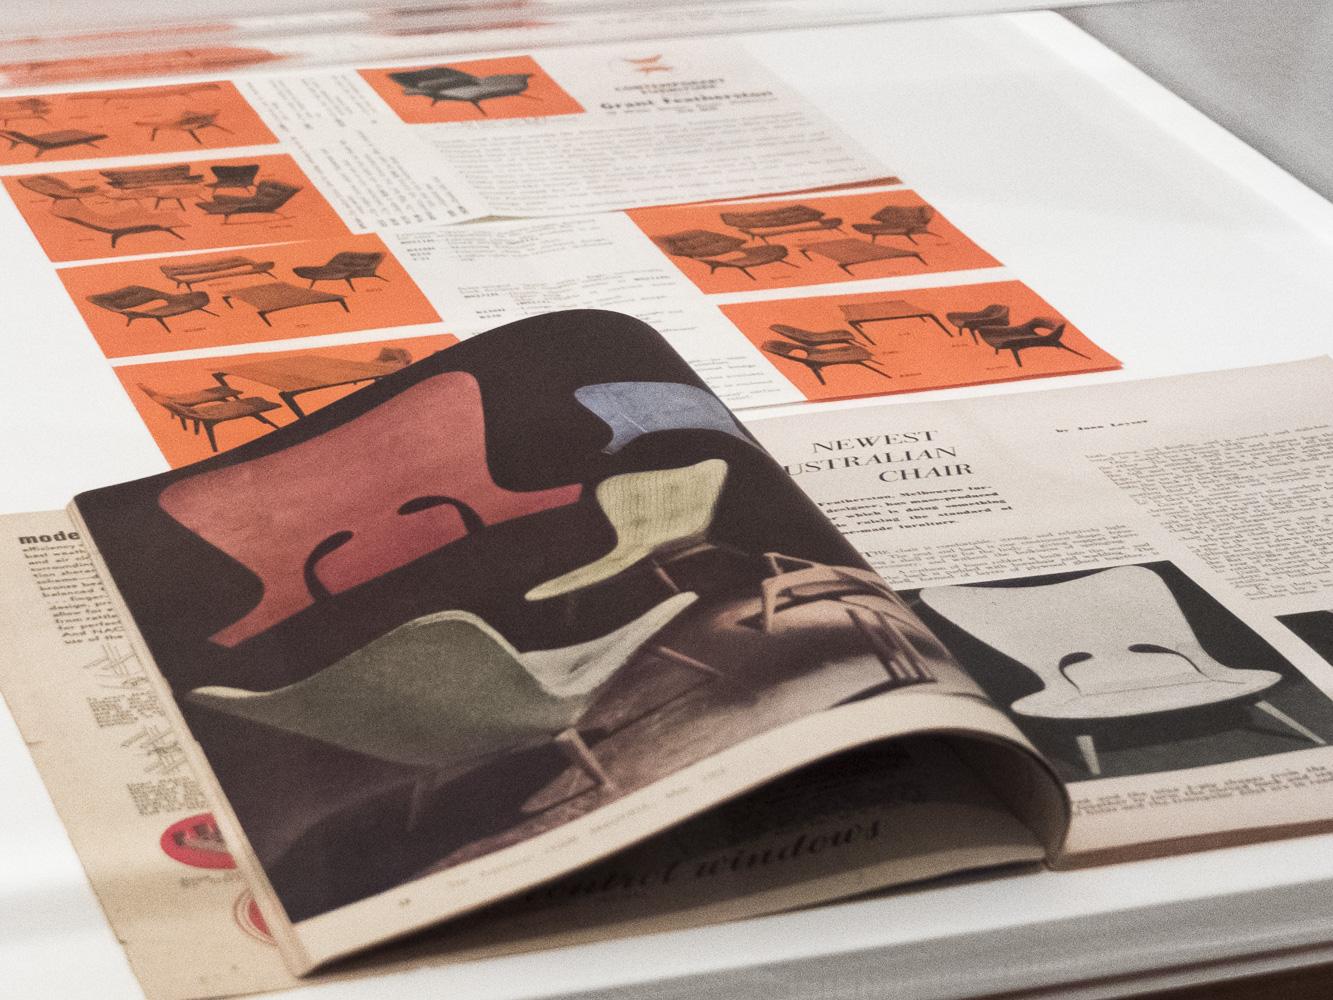 Heide Featherston Exhibition Cantilever Interiors Furniture Design (14).JPG